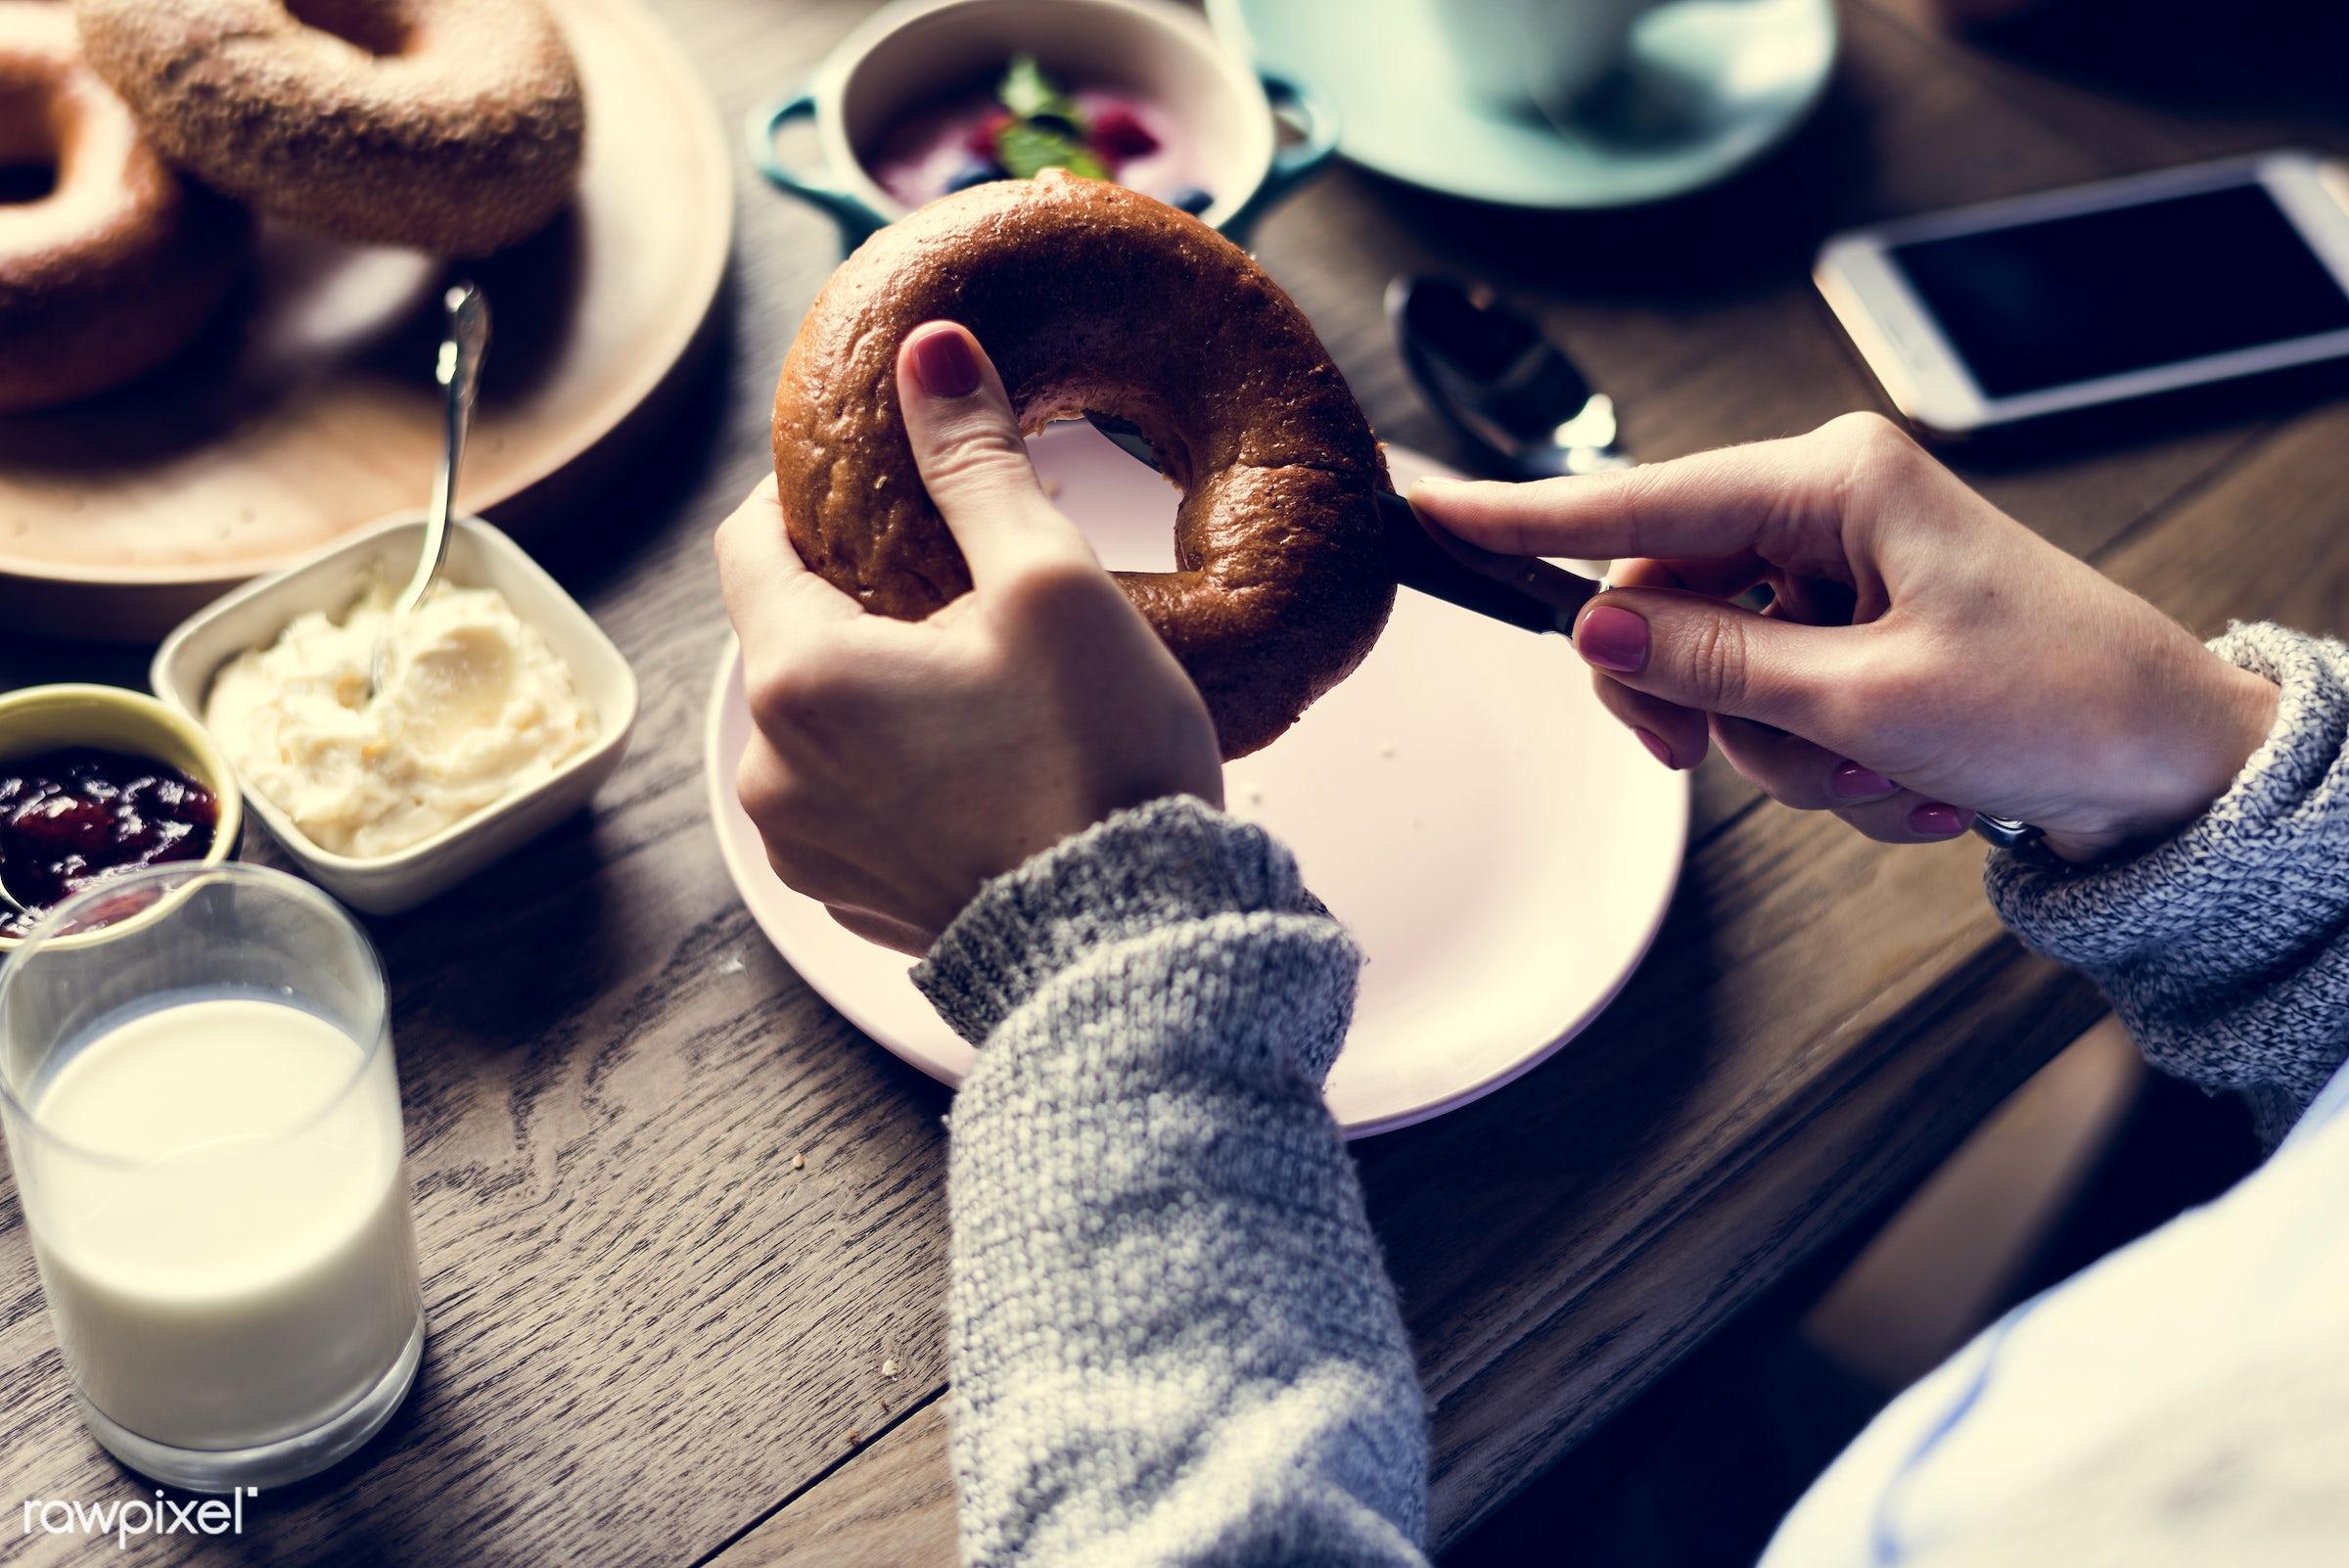 cup, dish, person, yoghurt, holding, breakfast, people, drinks, bakery, hands, woman, milk, bread, mobile phone, jam, knife...